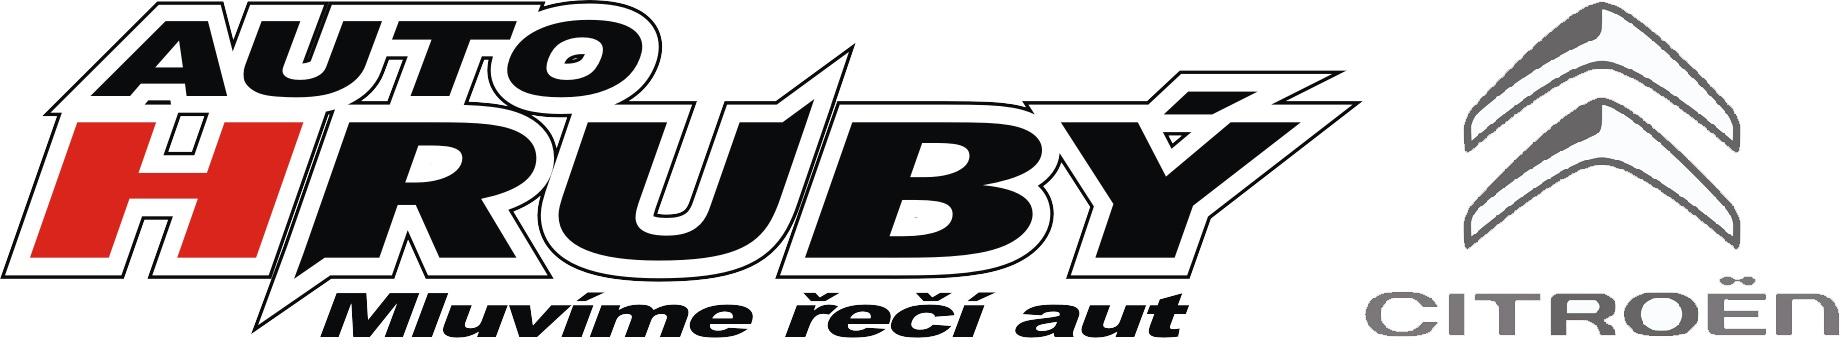 logo_auto hruby